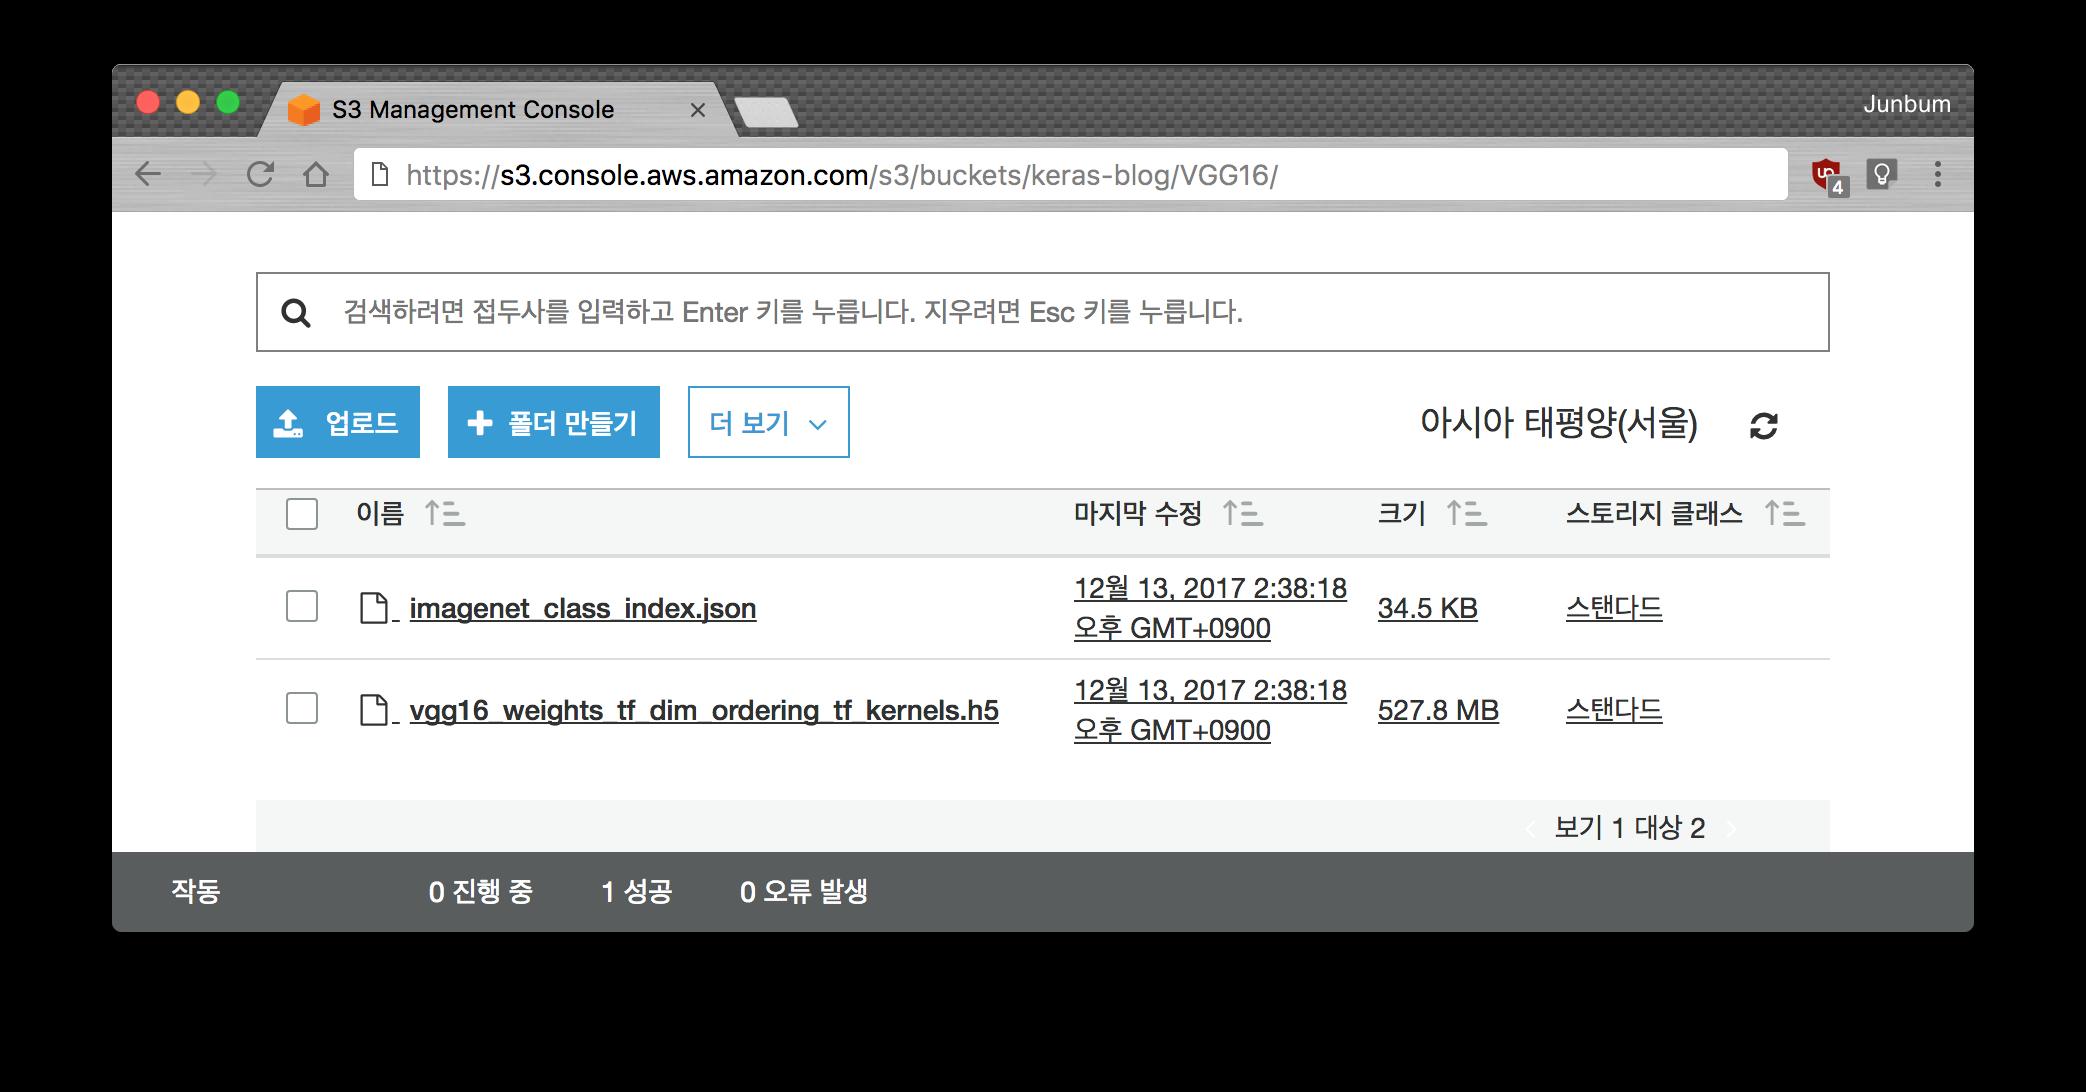 keras-blog 버킷에 올린 모델 파일